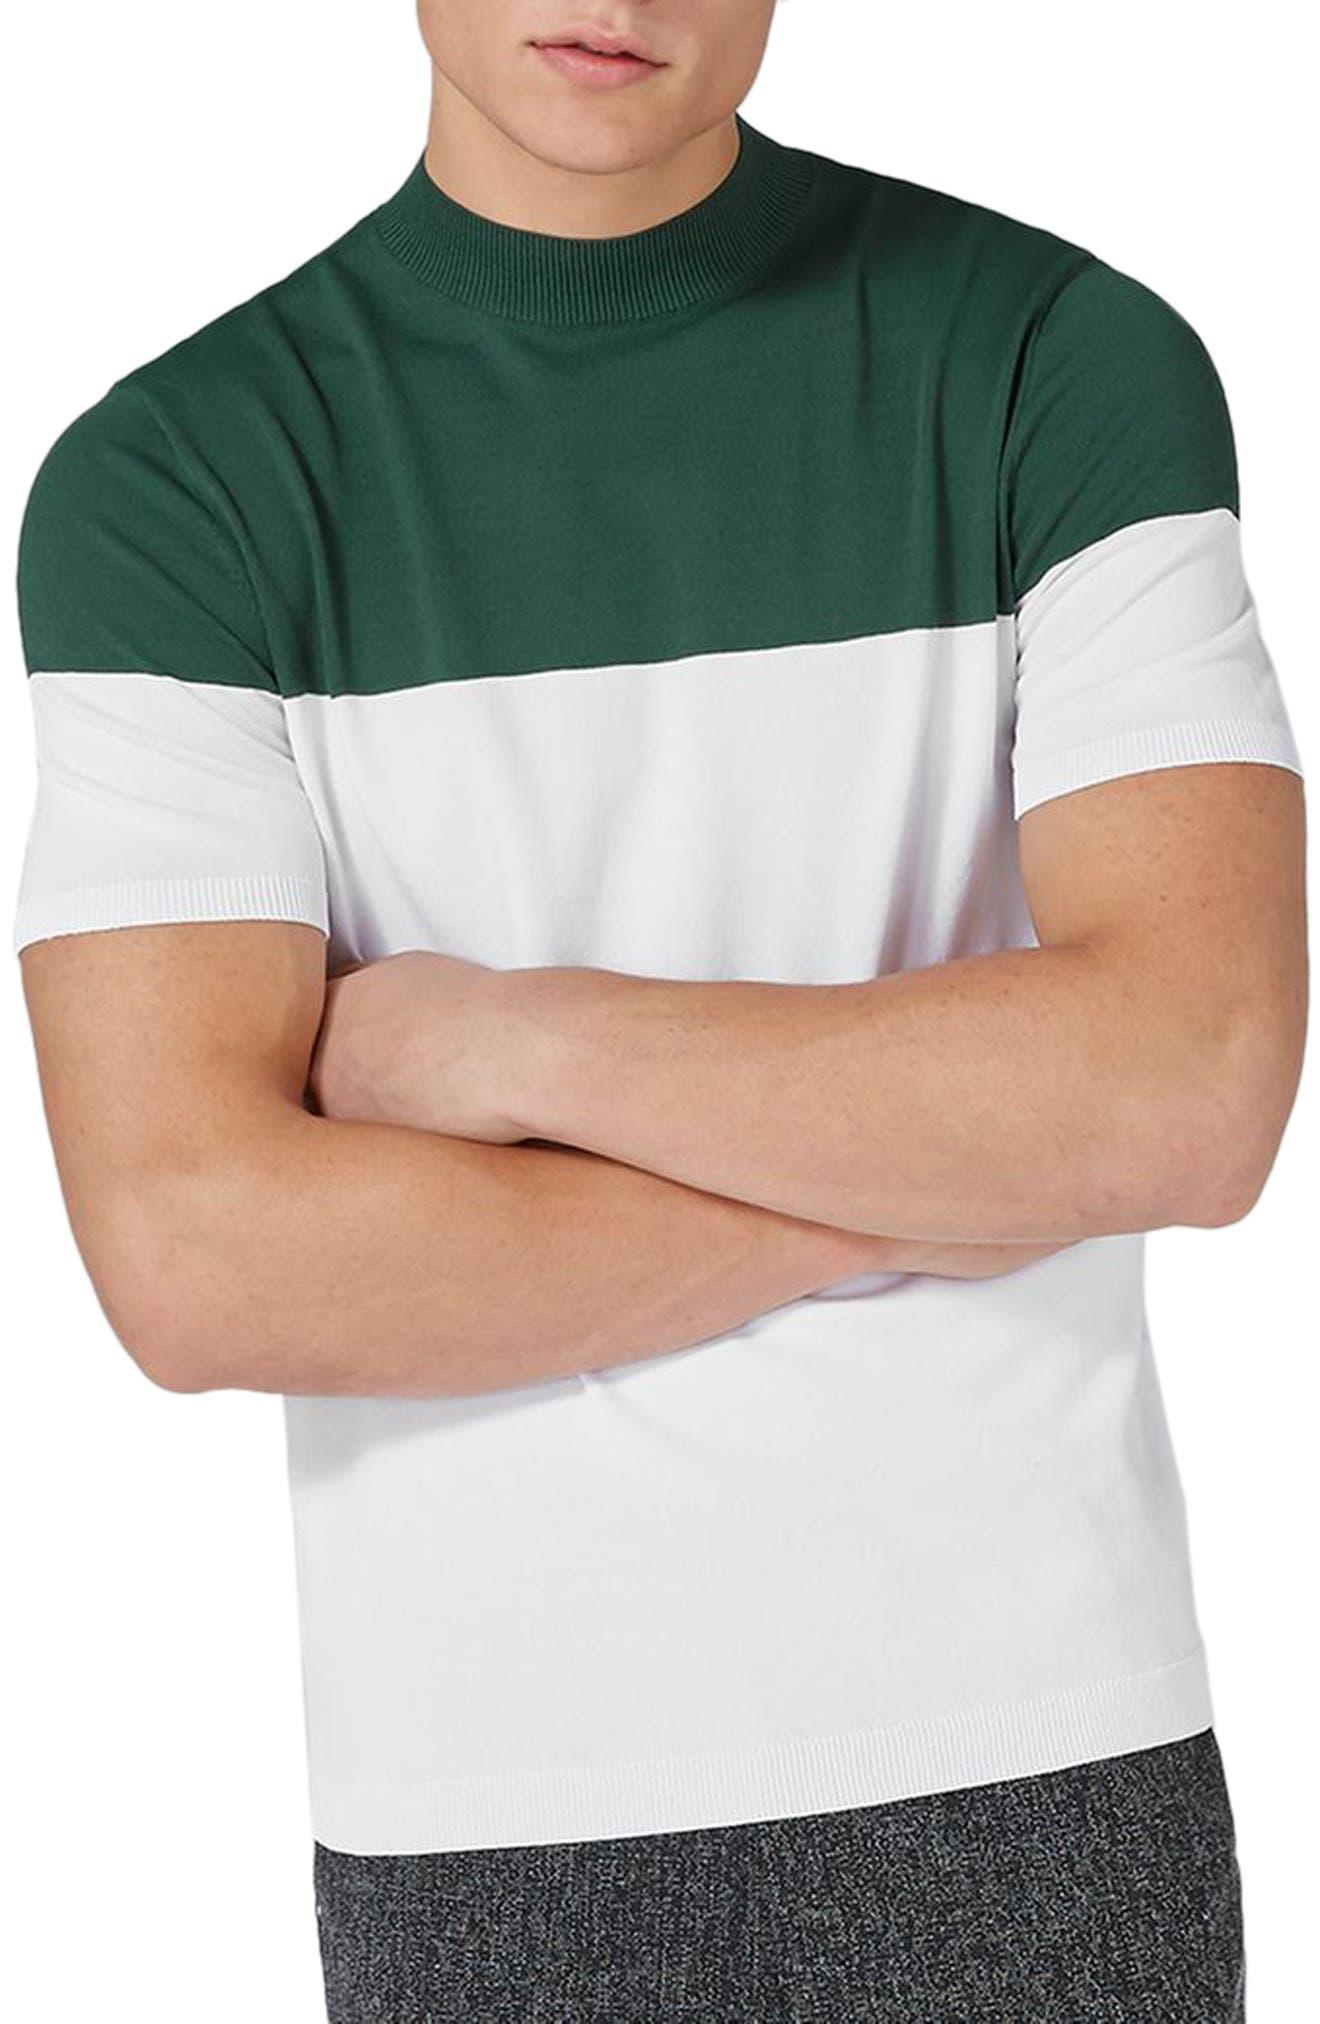 Colorblock Mock Neck Sweater,                         Main,                         color, Green Multi